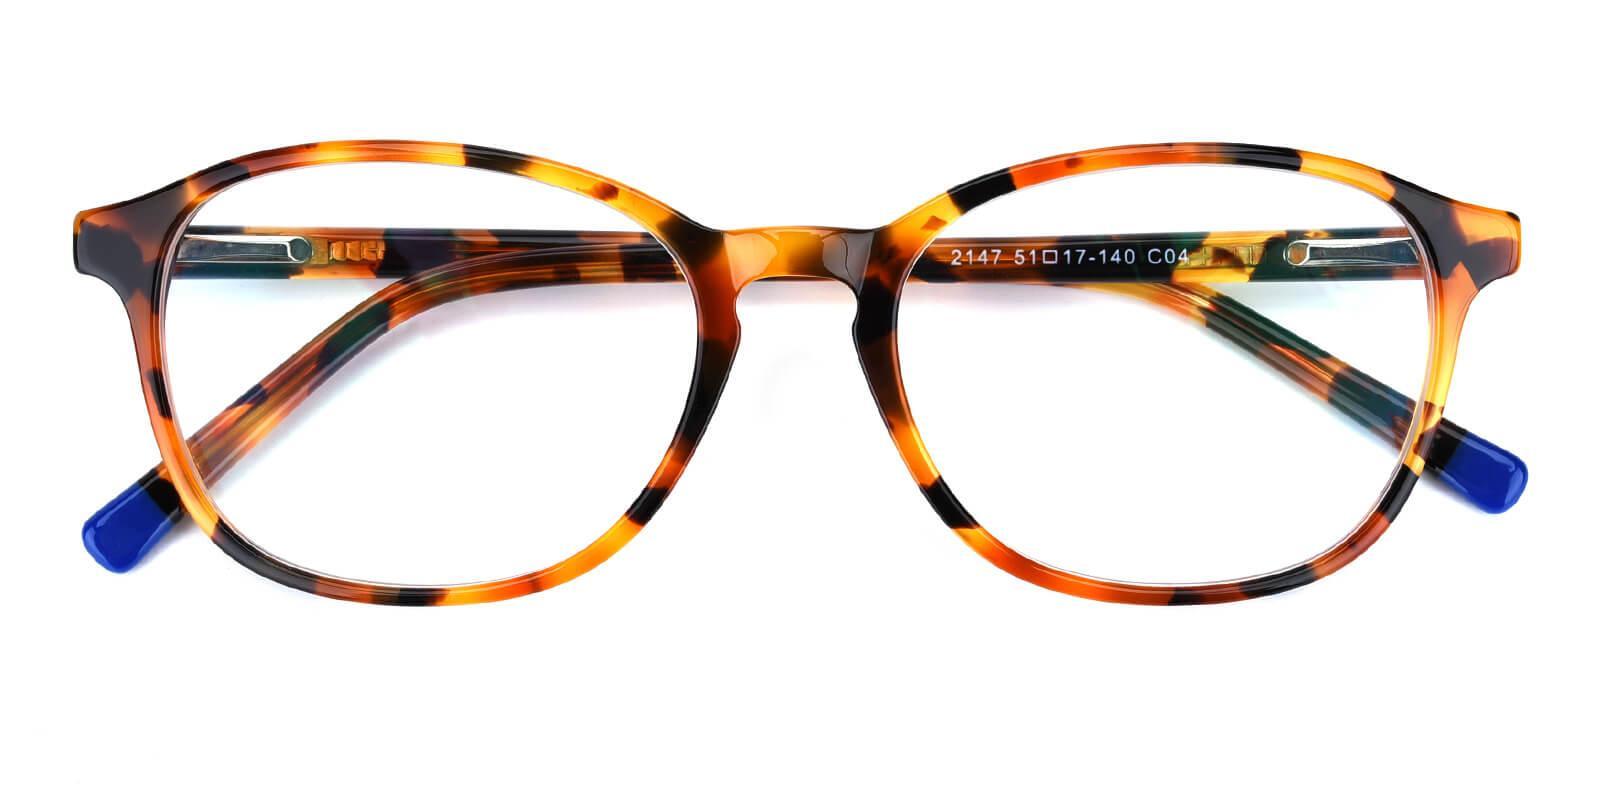 Grunei-Tortoise-Square-Acetate-Eyeglasses-detail